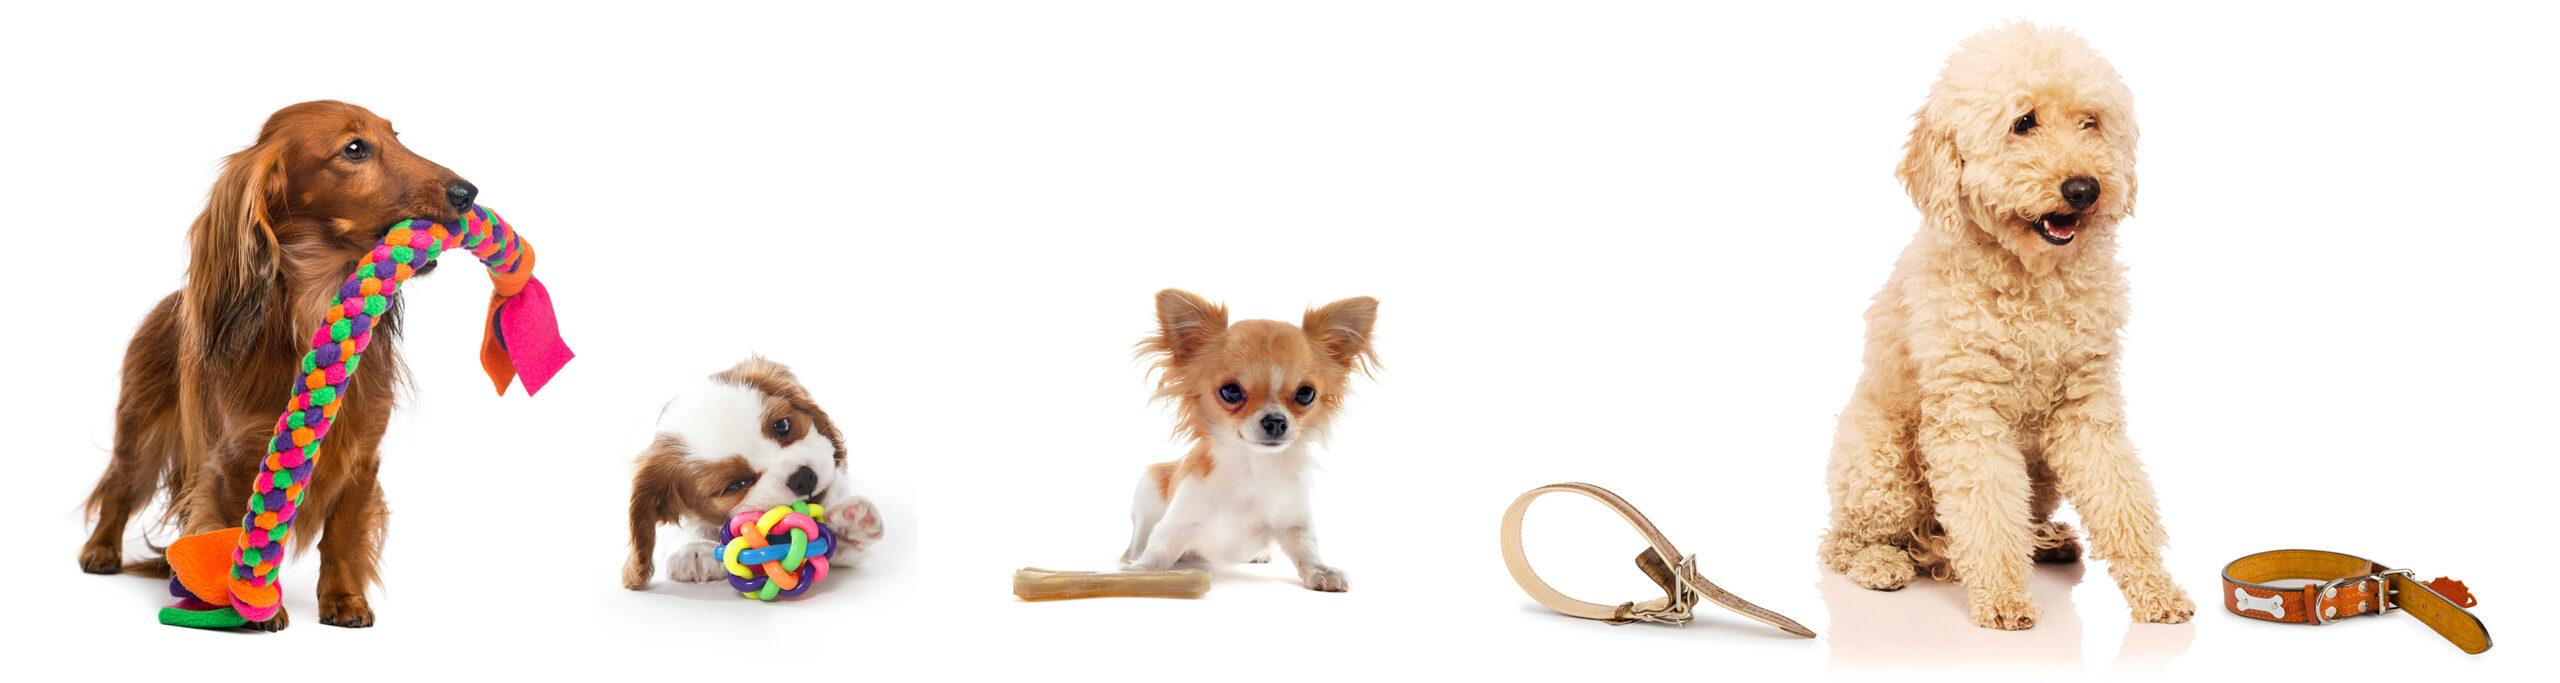 Dog toys Puppy toys Dog collars Dog leads